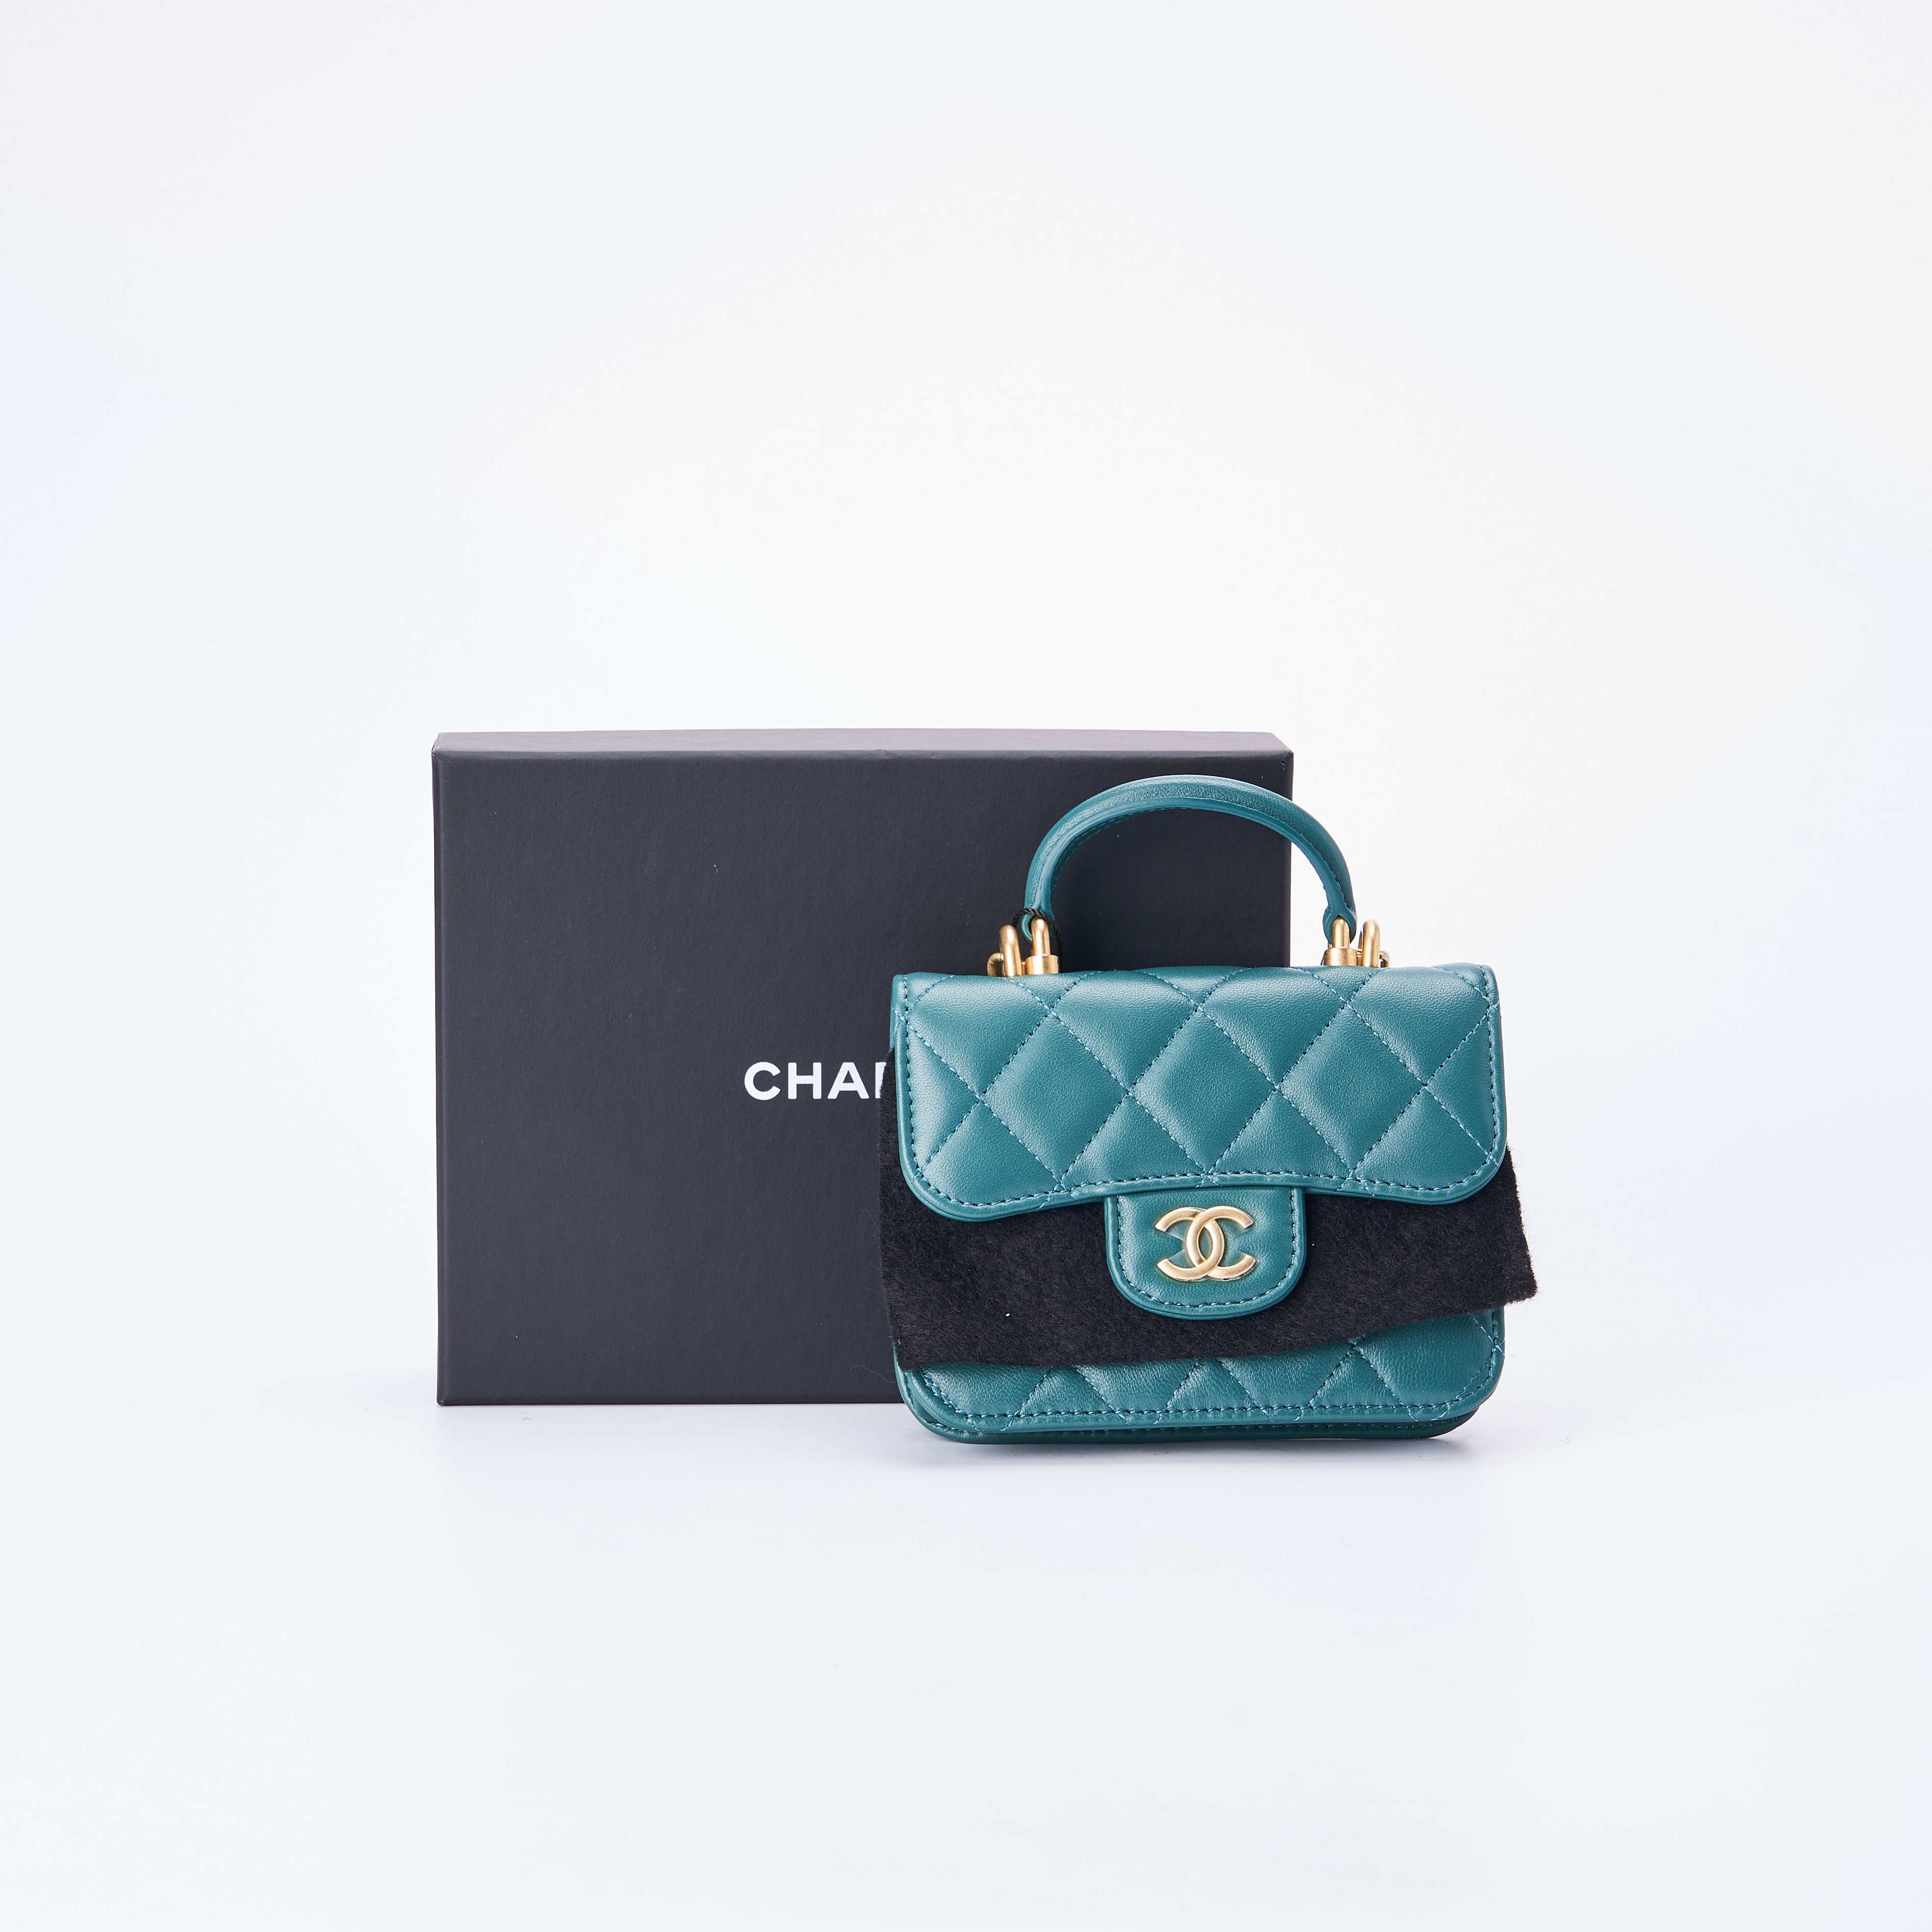 chanel链条包 临时【准新】Chanel香奈儿 柄口盖链条包 12*9 公价¥13000_推荐淘宝好看的chanel链条包